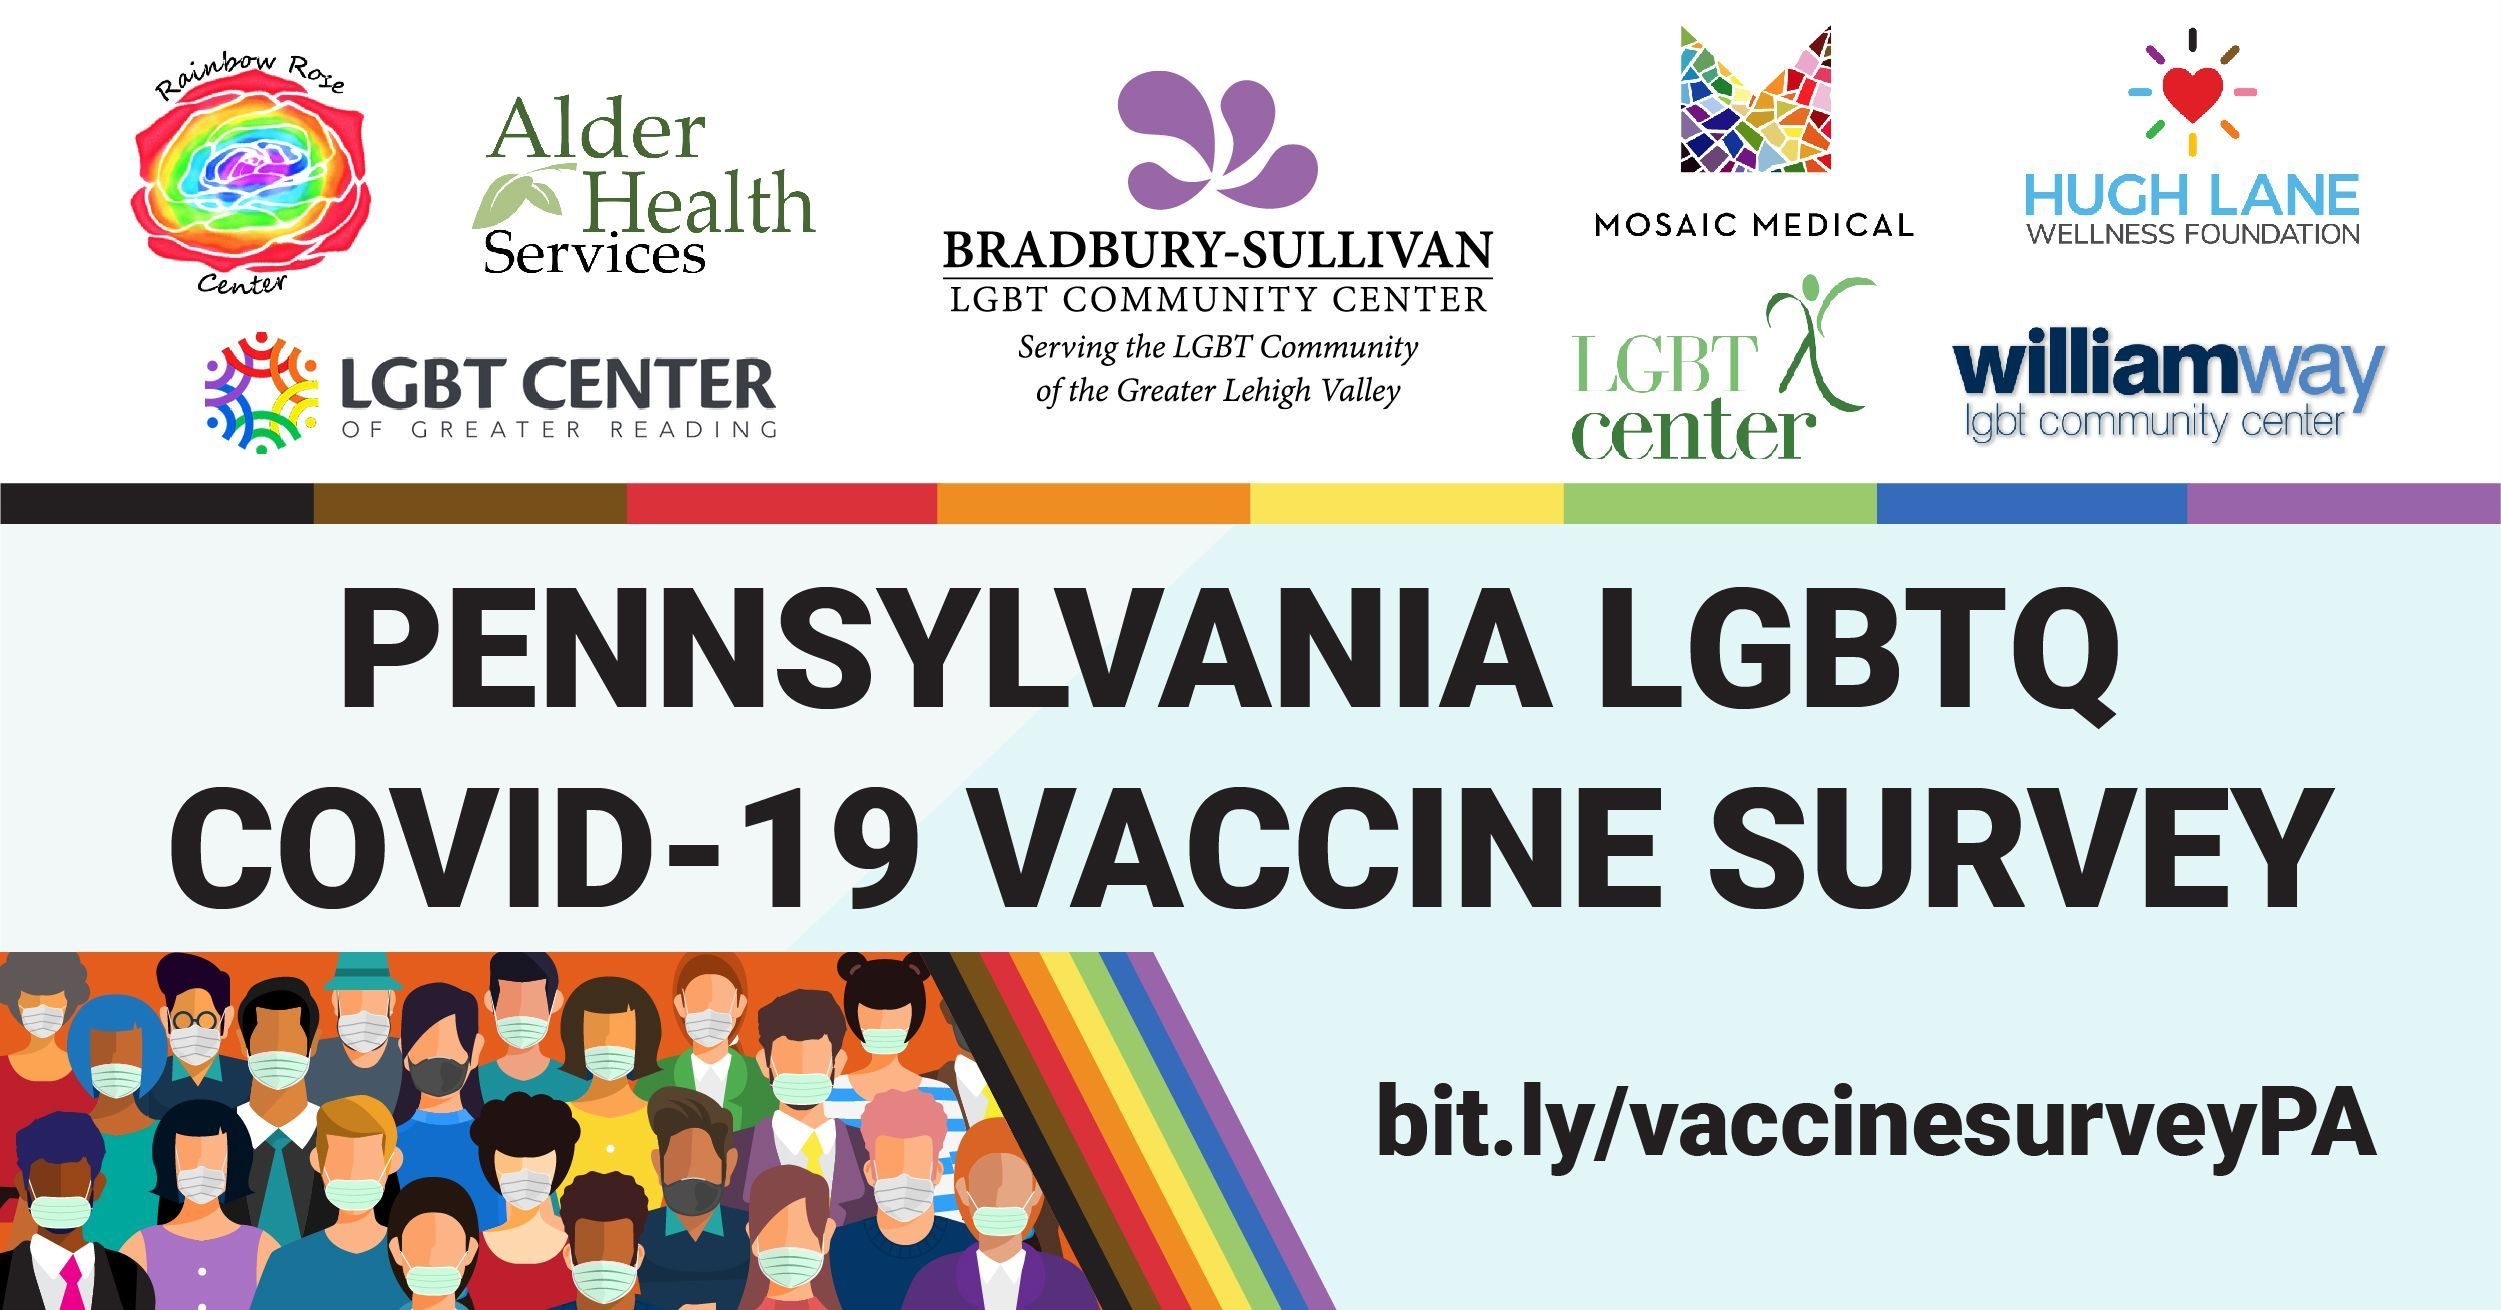 Pennsylvania LGBTQ COVID-19 Vaccine Survey